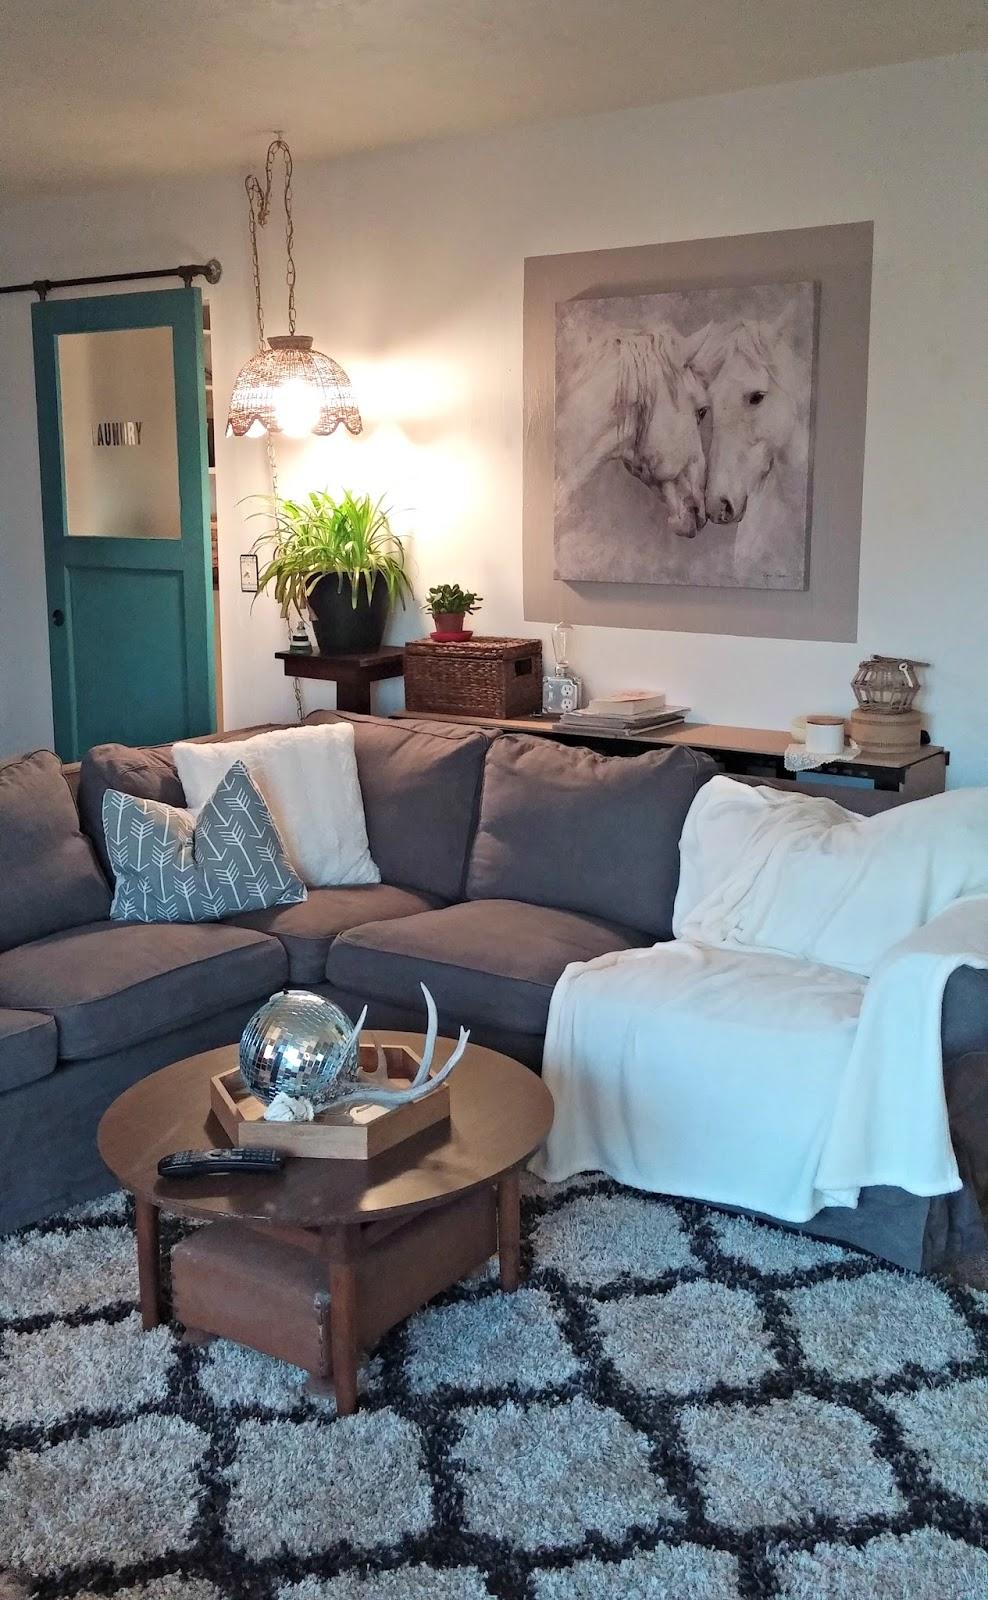 Cozy Minimalist Living Room Reveal - Little Vintage Cottage on Minimalist Living Room  id=23651